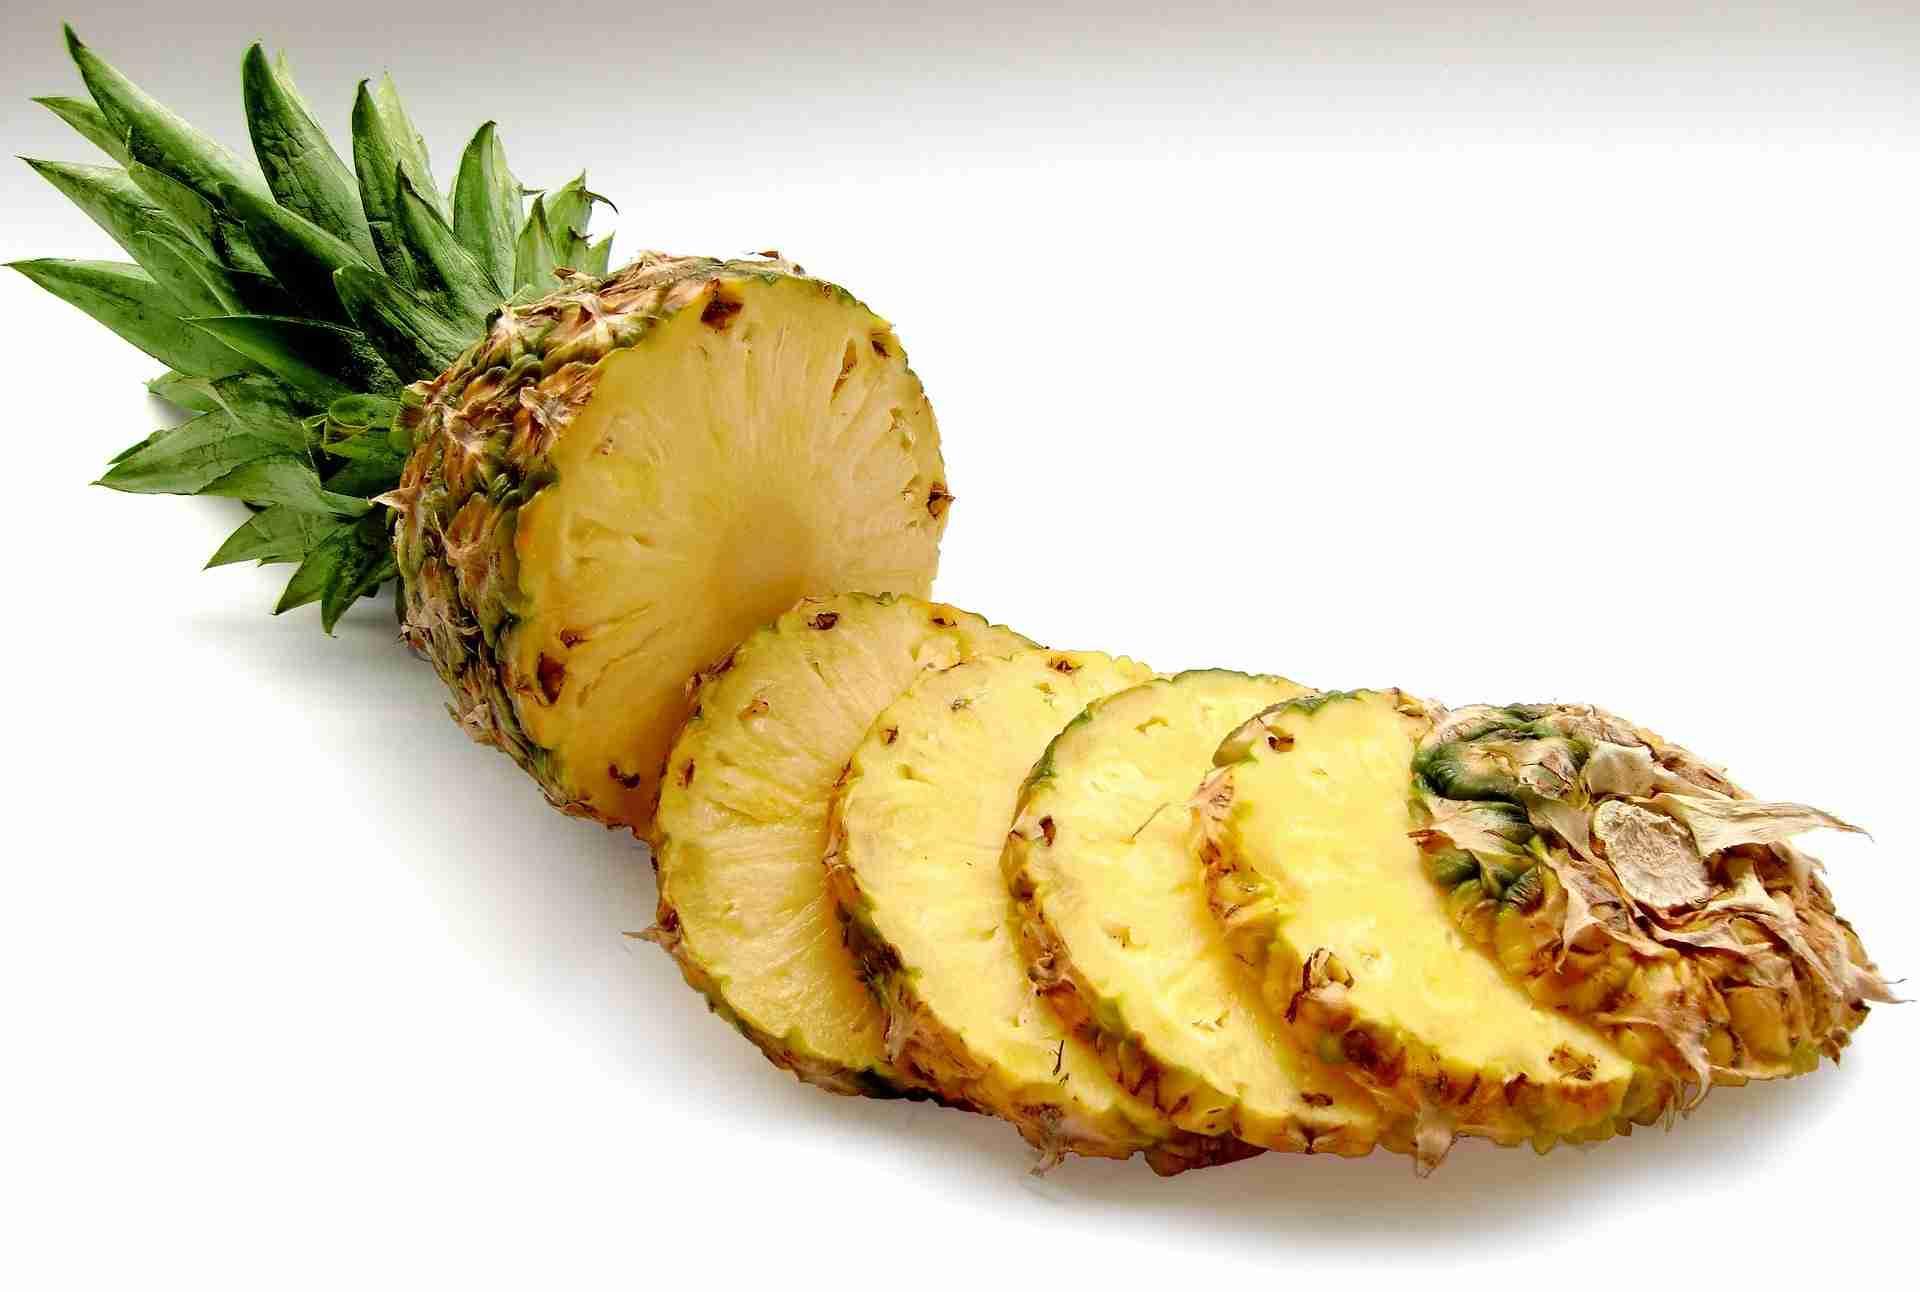 Ananas reif erkennen